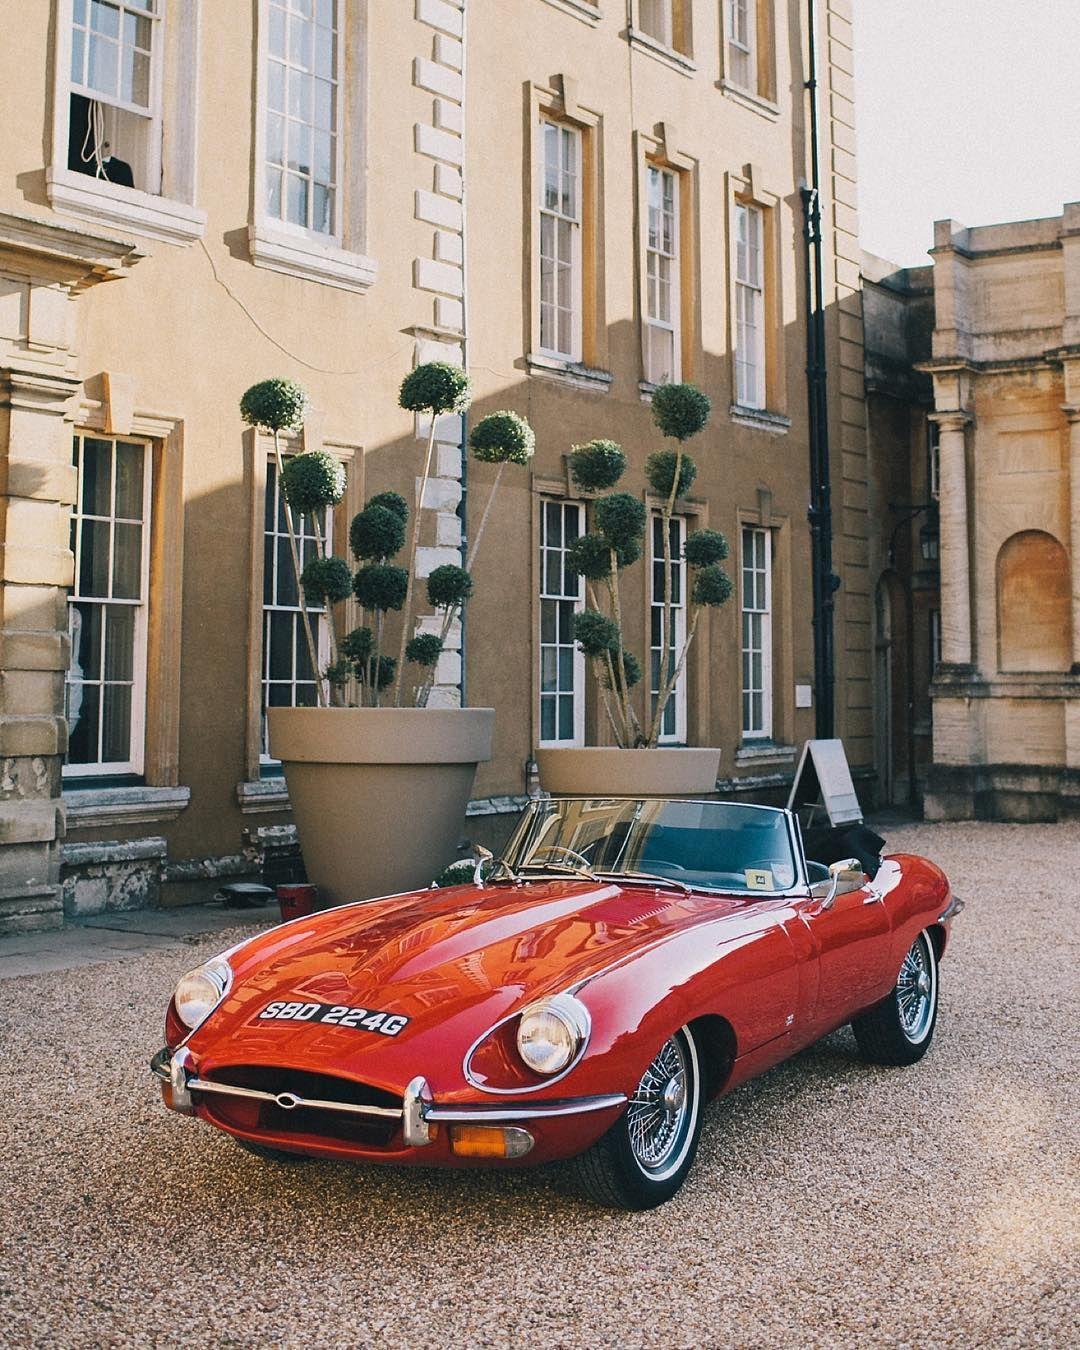 Classic Red Jaguar London Aynhoepark Wedding Alternativebride Alternativeweddingphotographer Wehea Jaguar Car Cool Sports Cars Jaguar